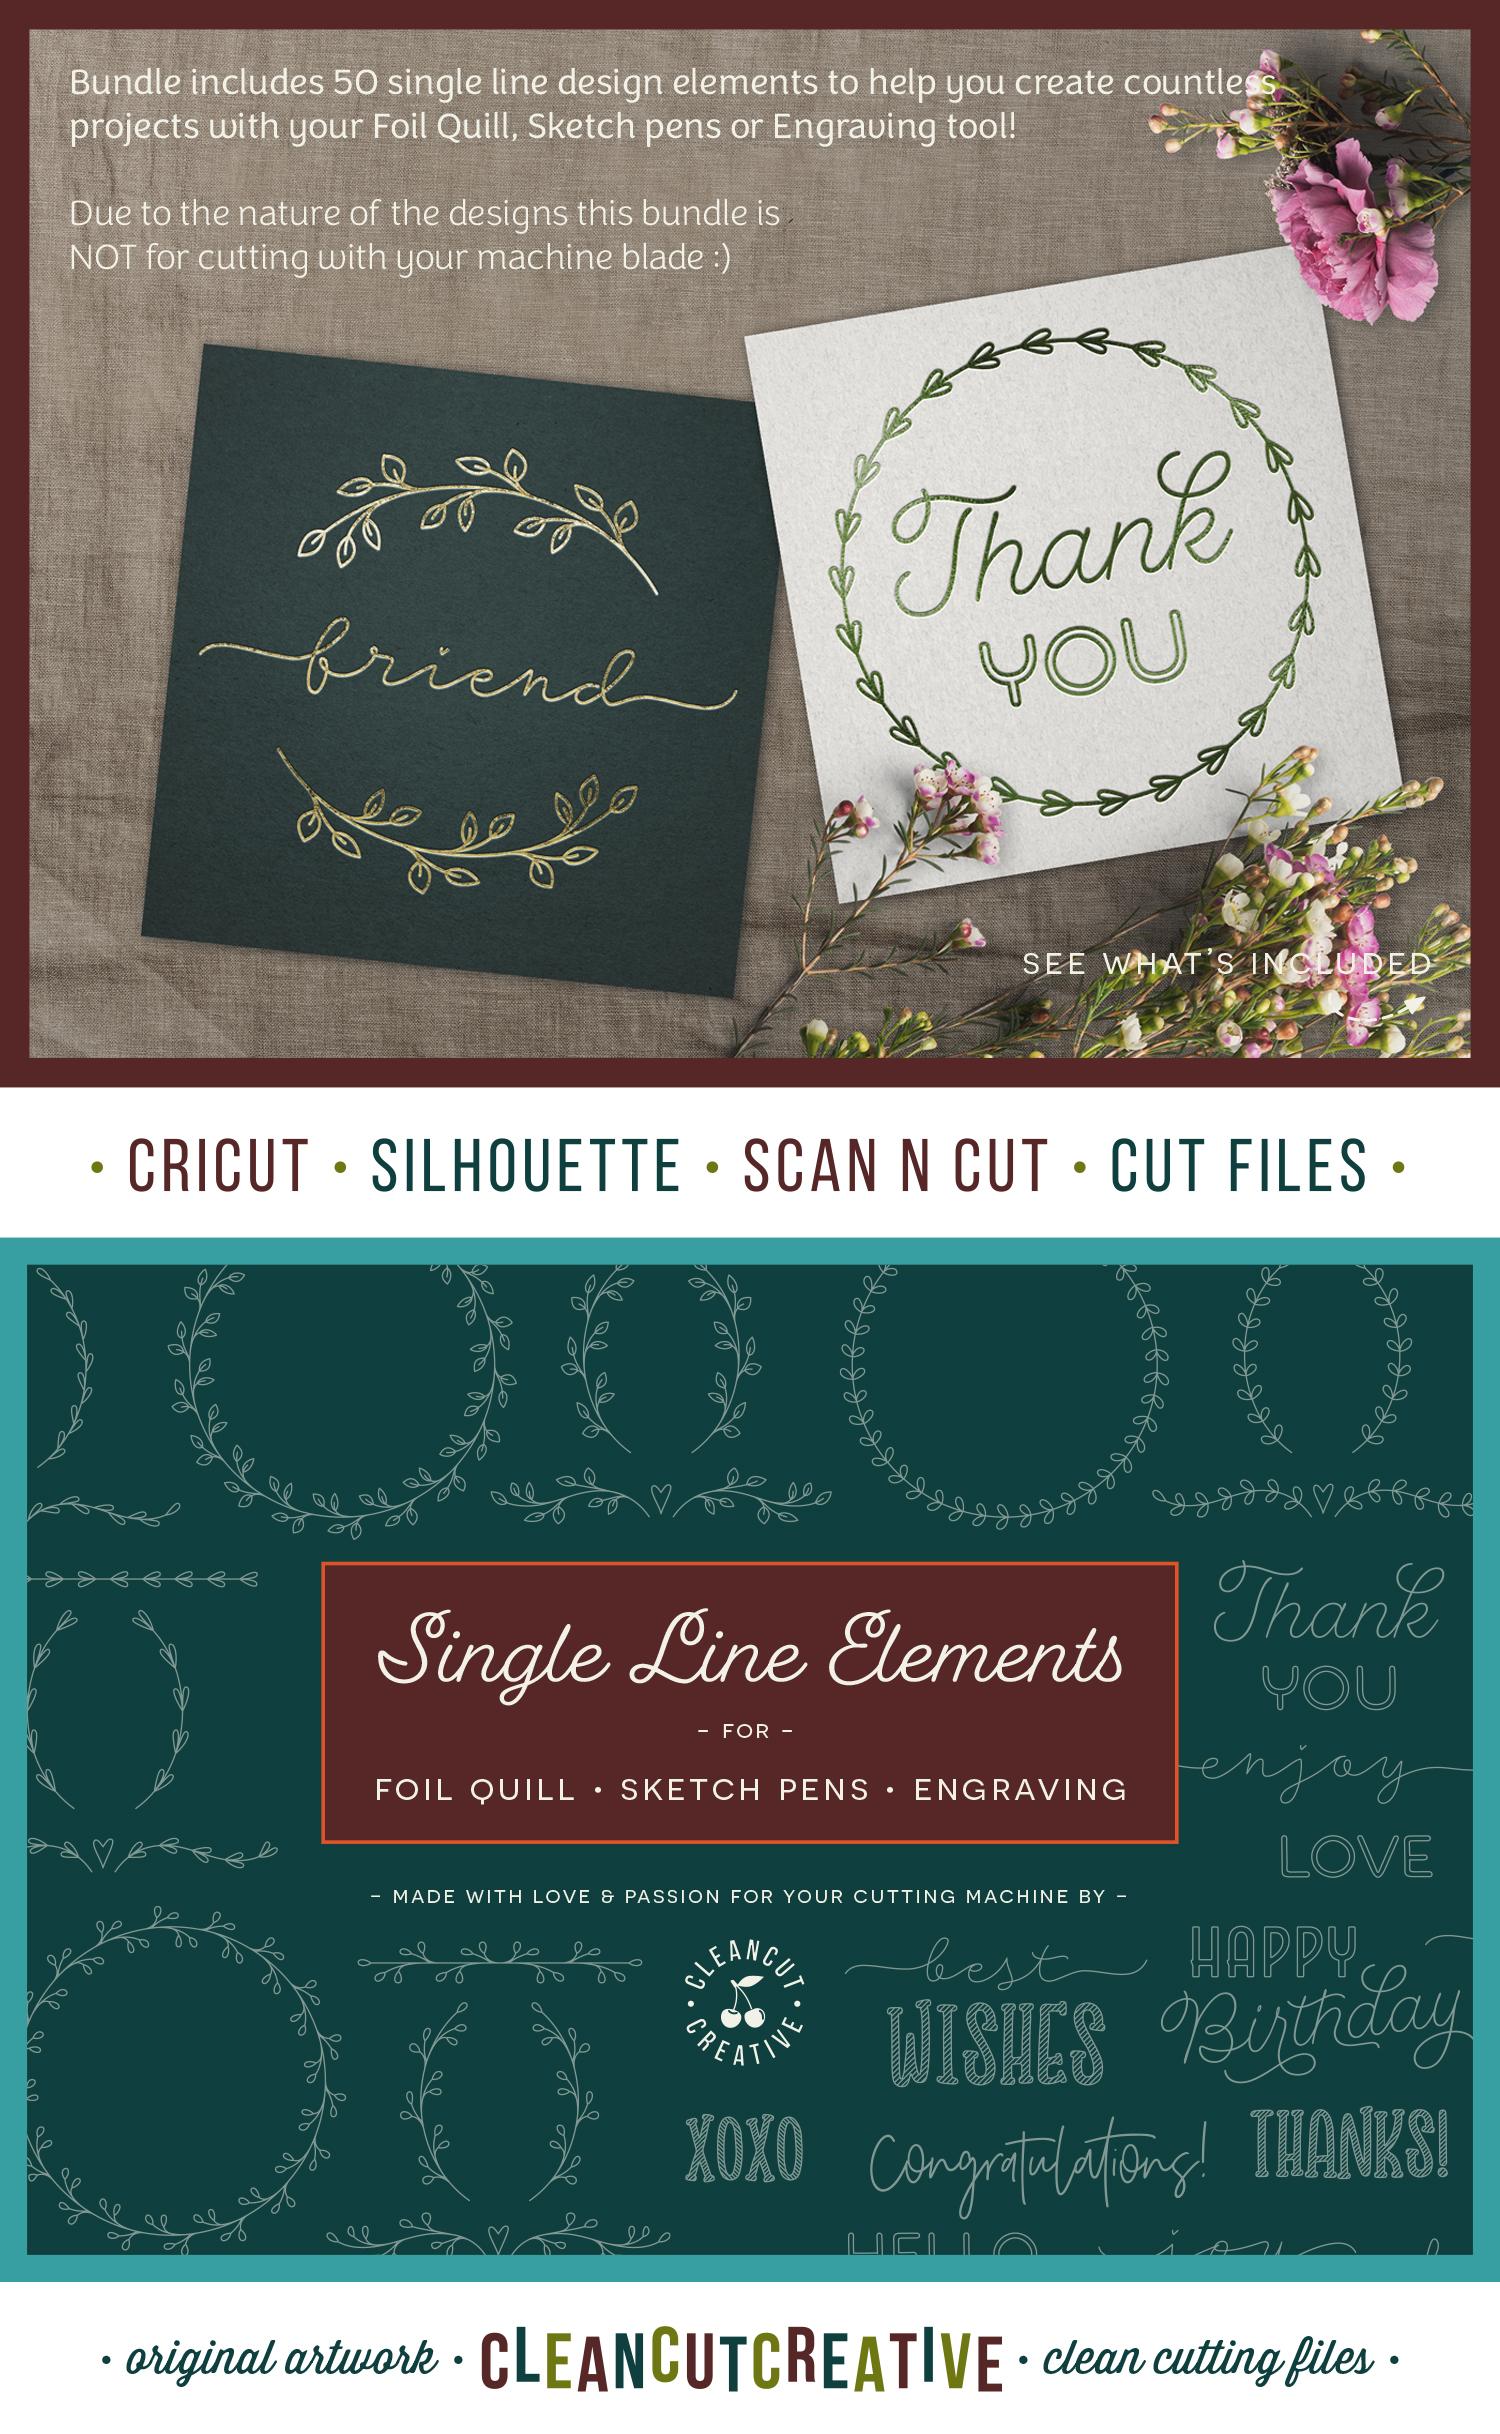 Foil Quill | Single Line | Sketch | SVG design elements example image 12